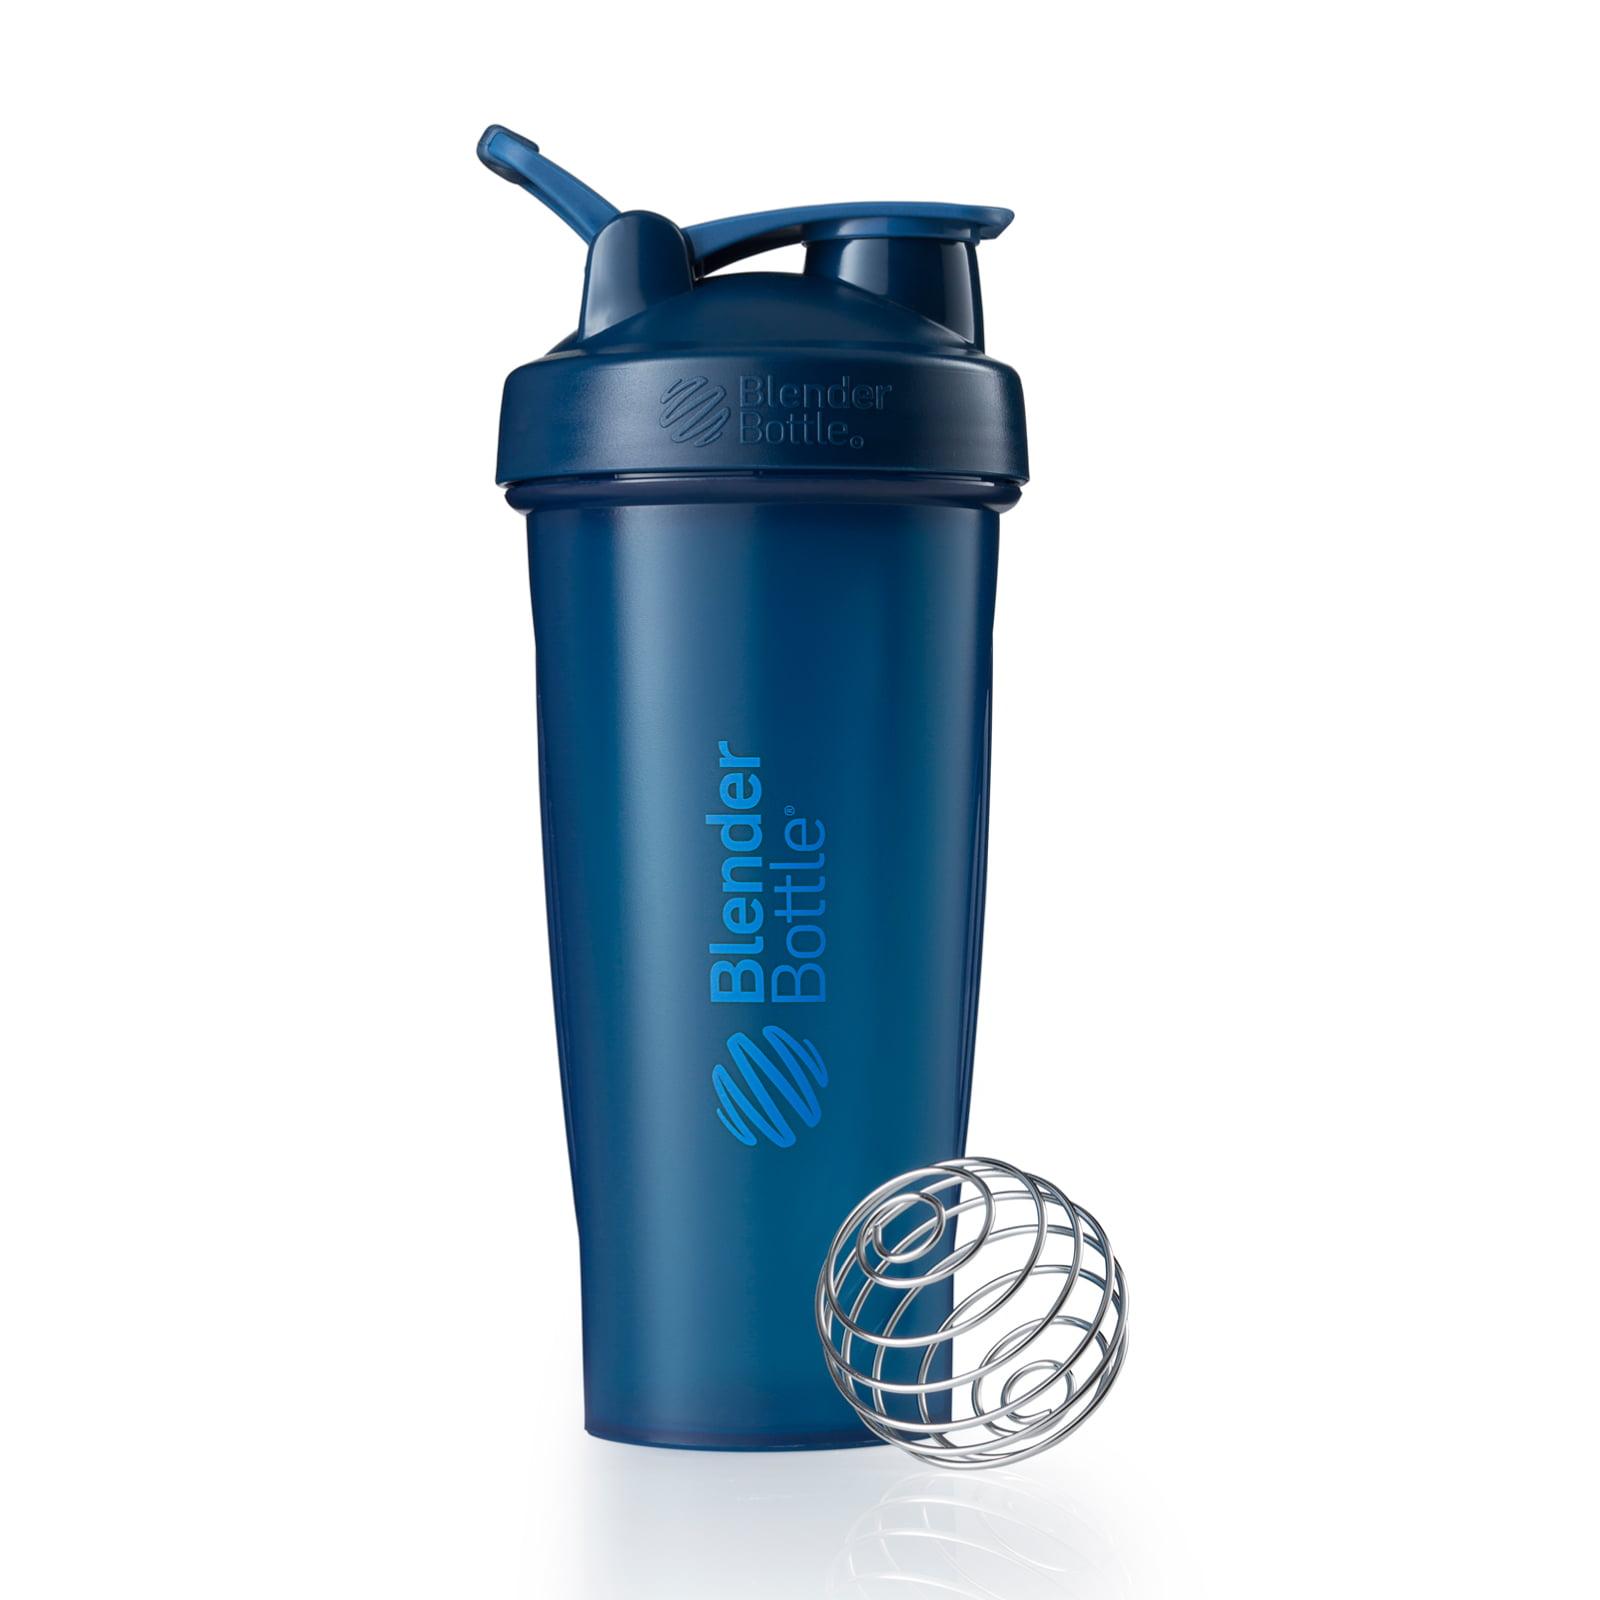 16 oz, Orange Shaker Bottle BPA Free /& Lid Mixing Technology MIXT Energy Shaker Bottle 16 oz